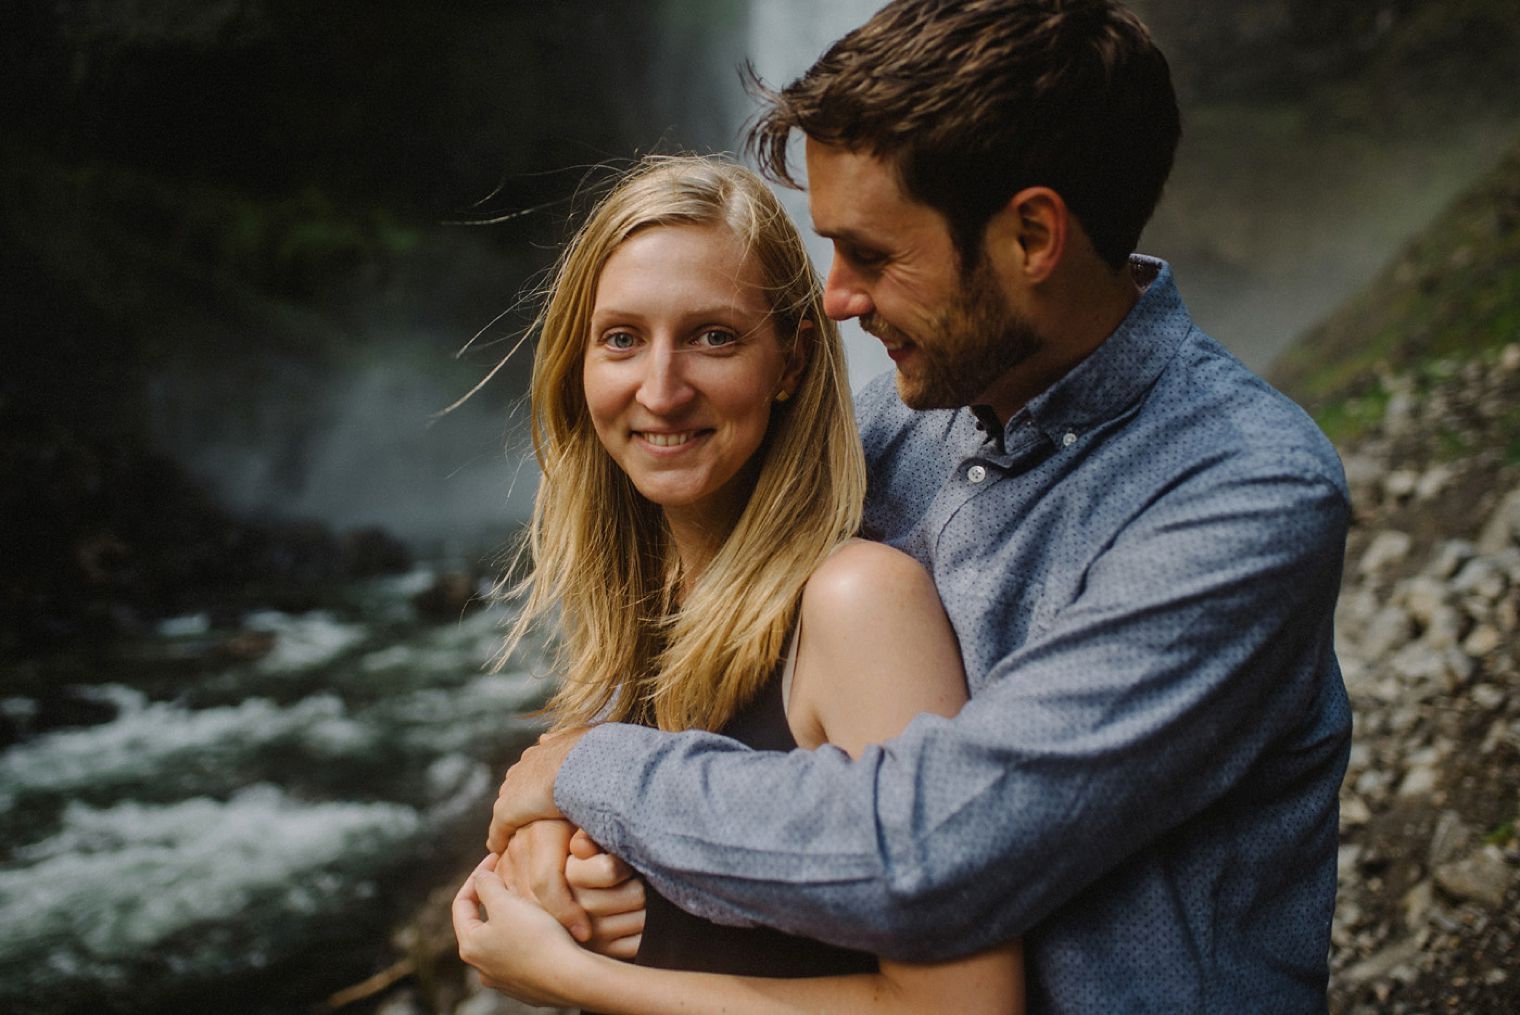 pacific northwest engagement photographer